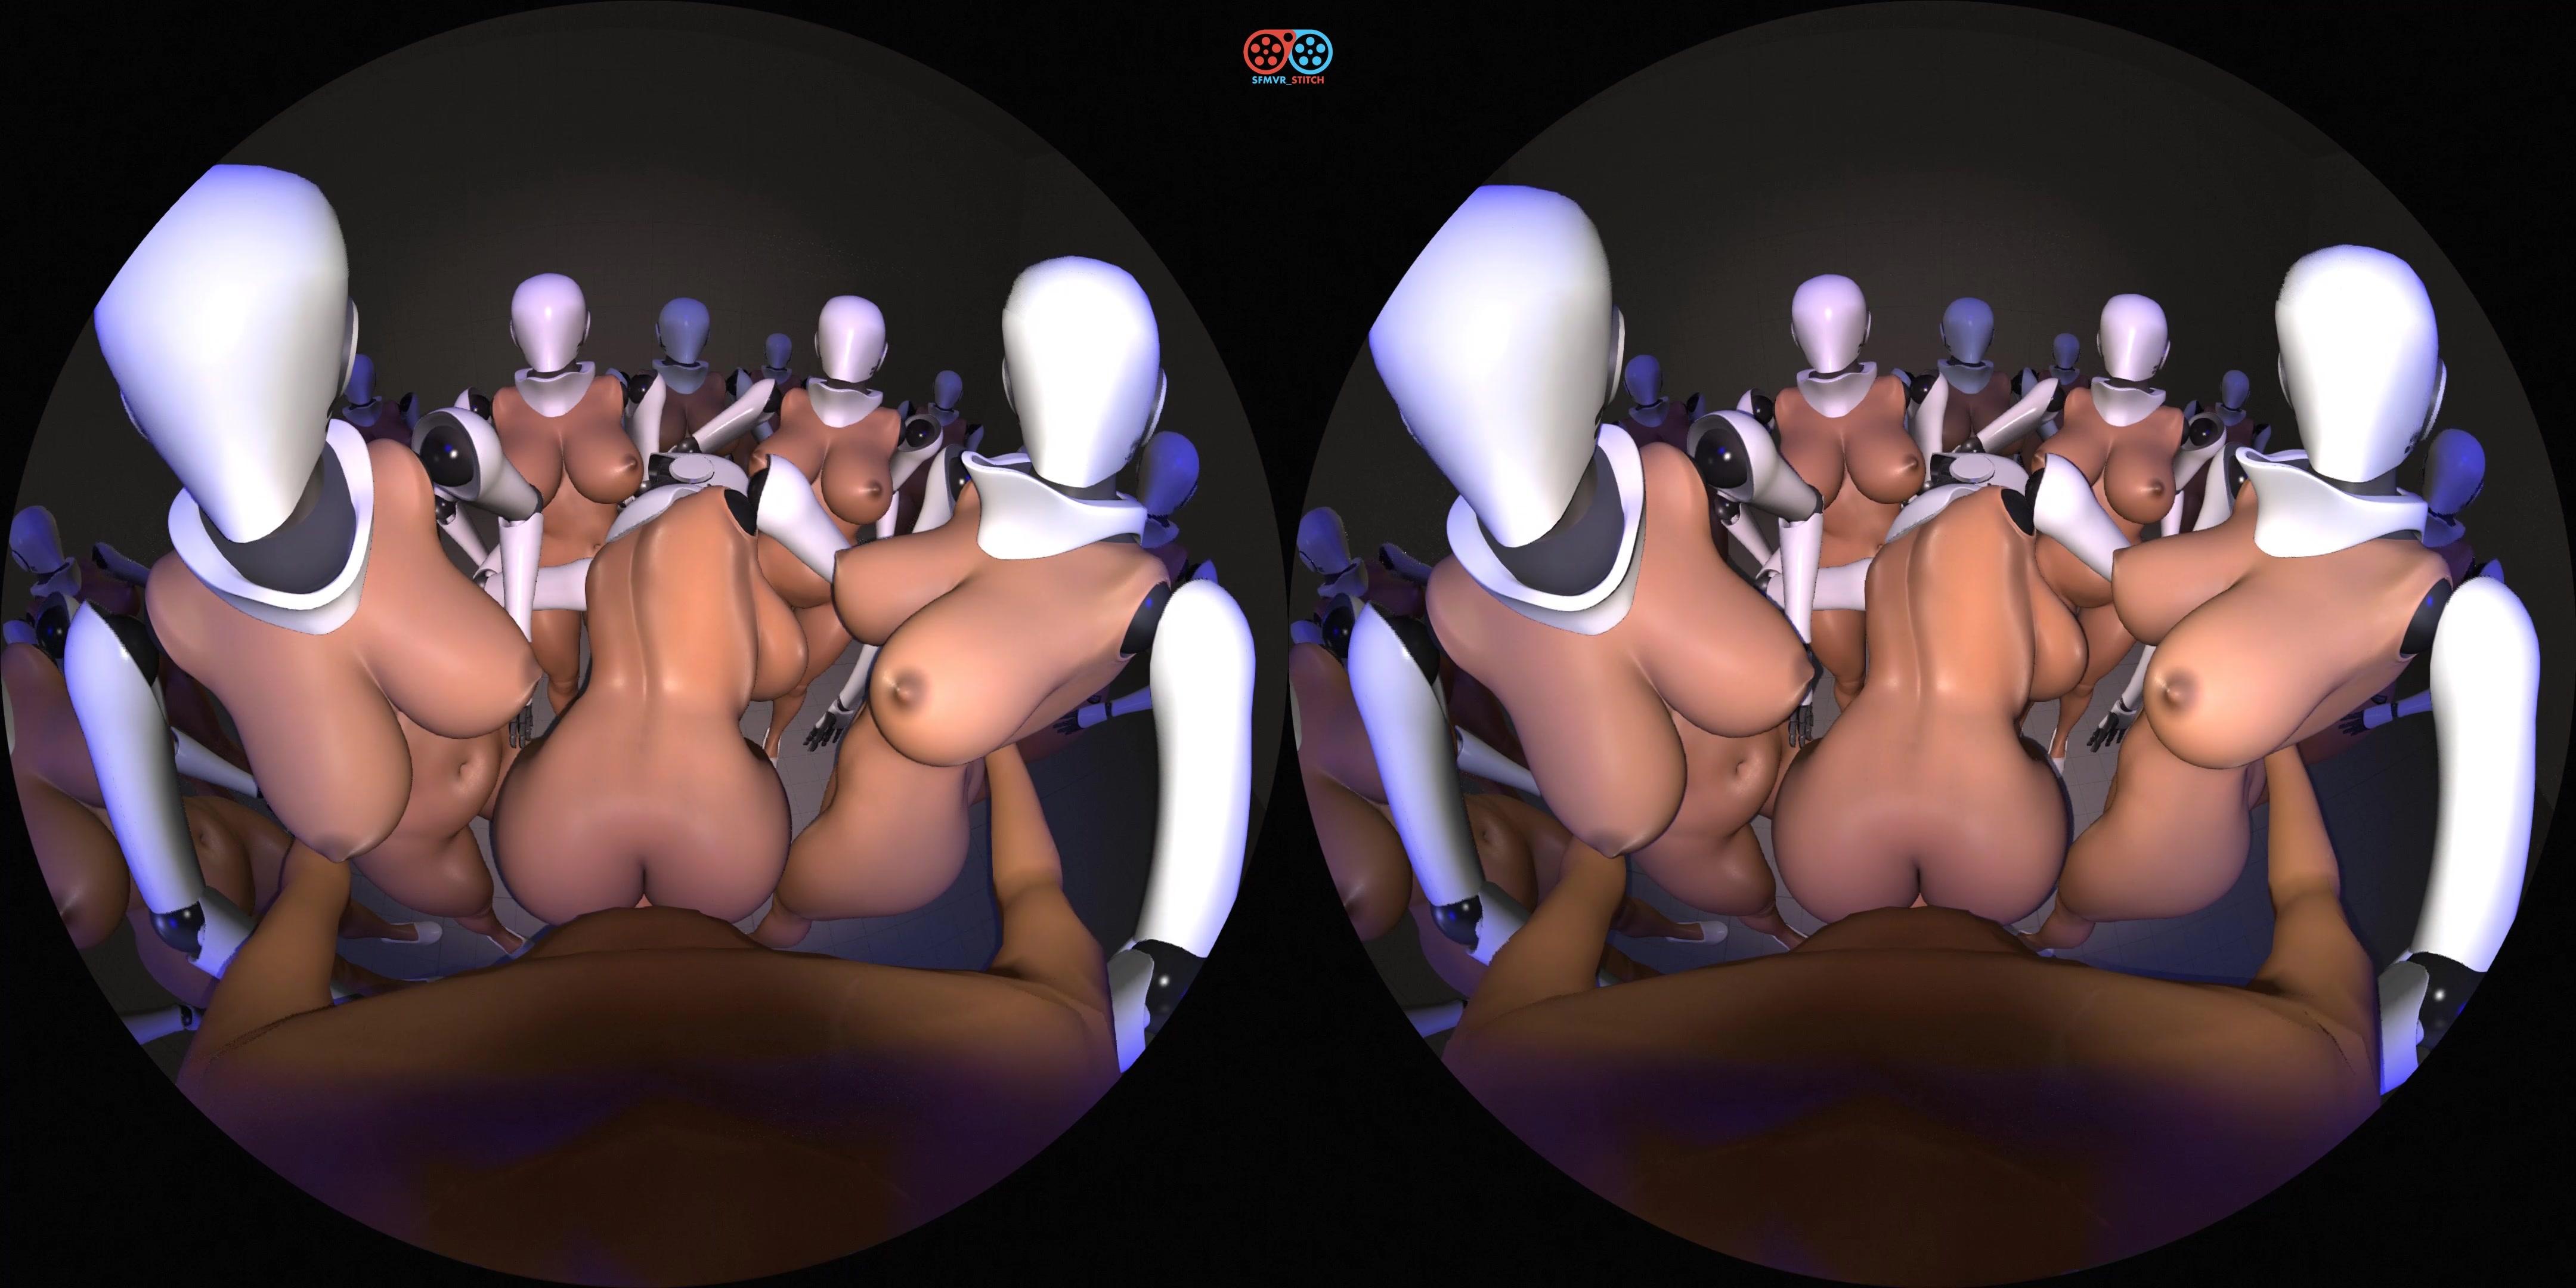 Hentai sex game meeting with big boobs teacher - 1 part 9